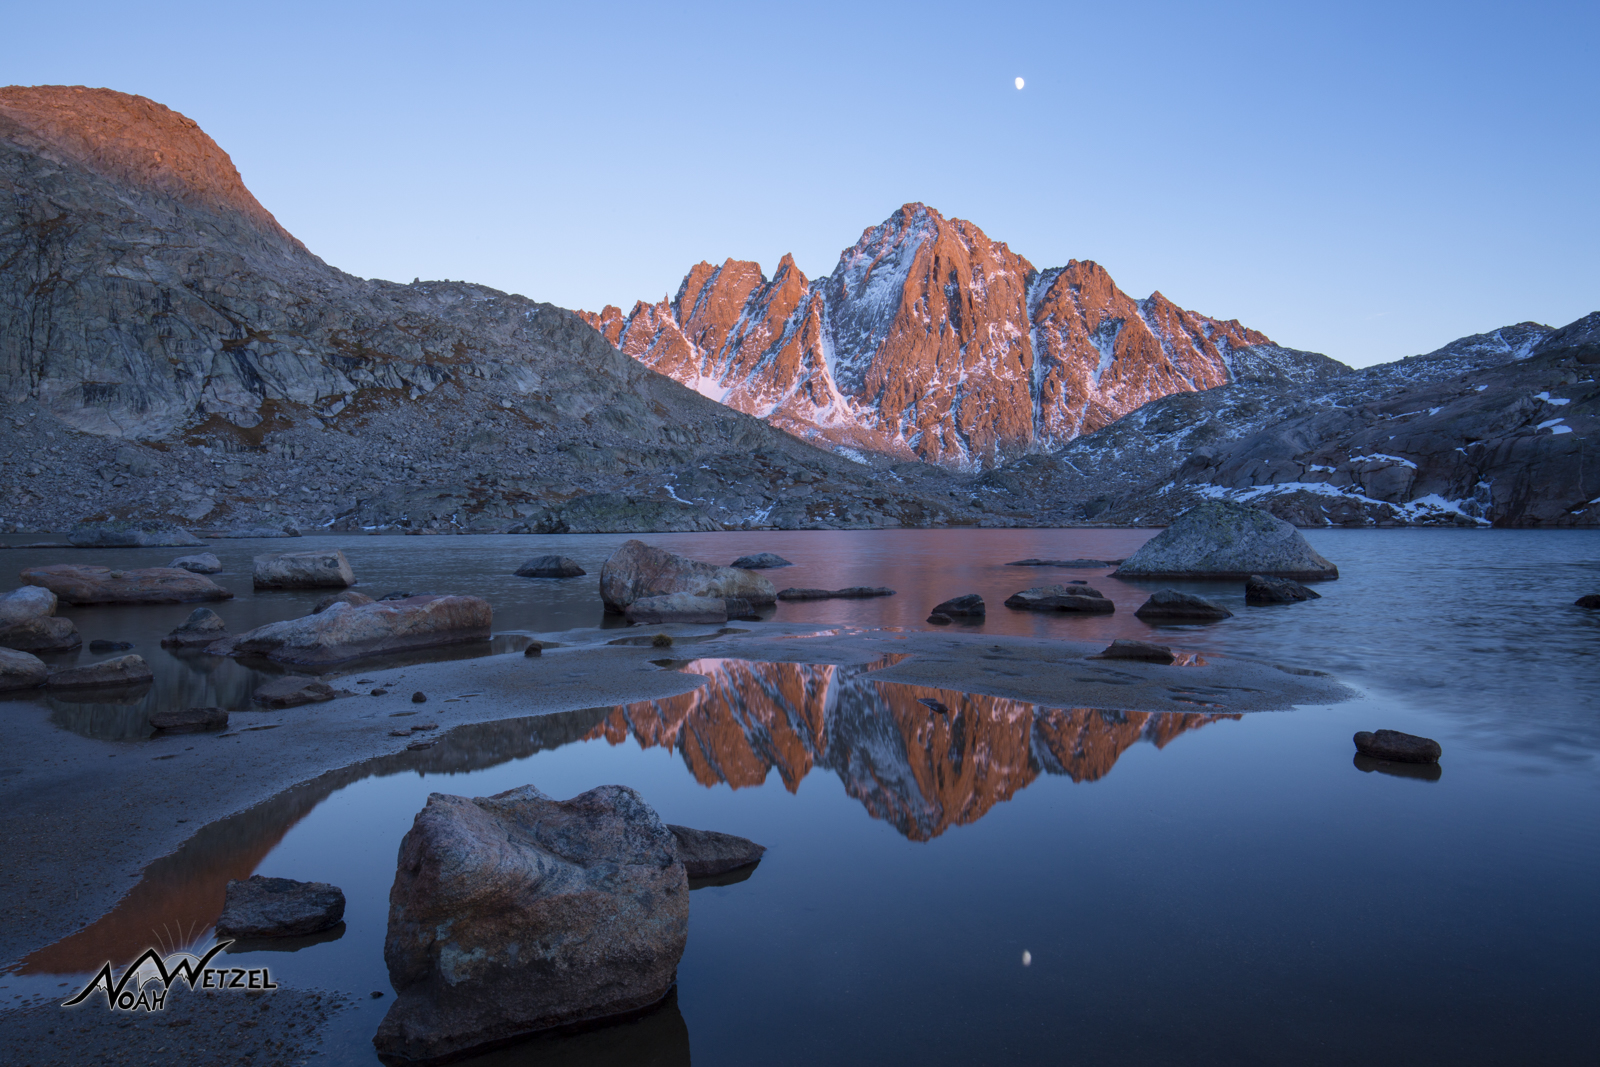 Harrower Peak Reflection at Indian Basin. Wind River Range. Wyoming